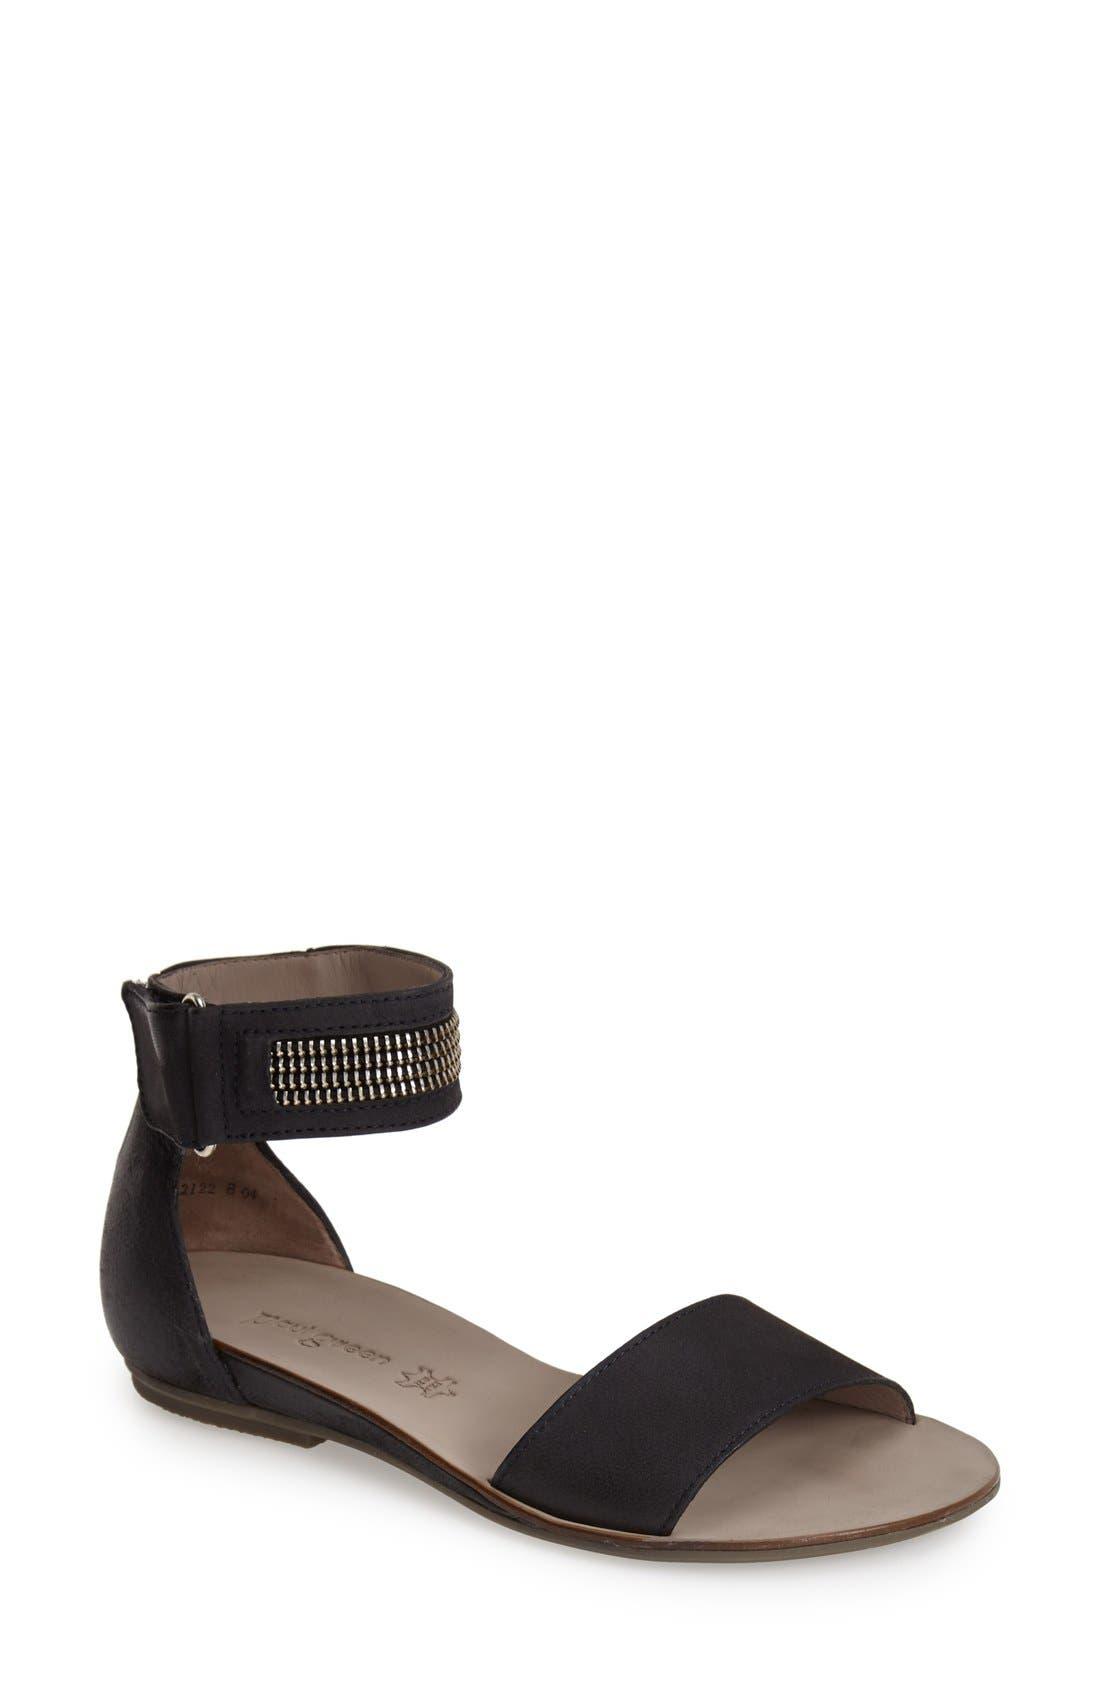 Main Image - Paul Green 'Cotie' Ankle Strap Flat Sandal (Women)